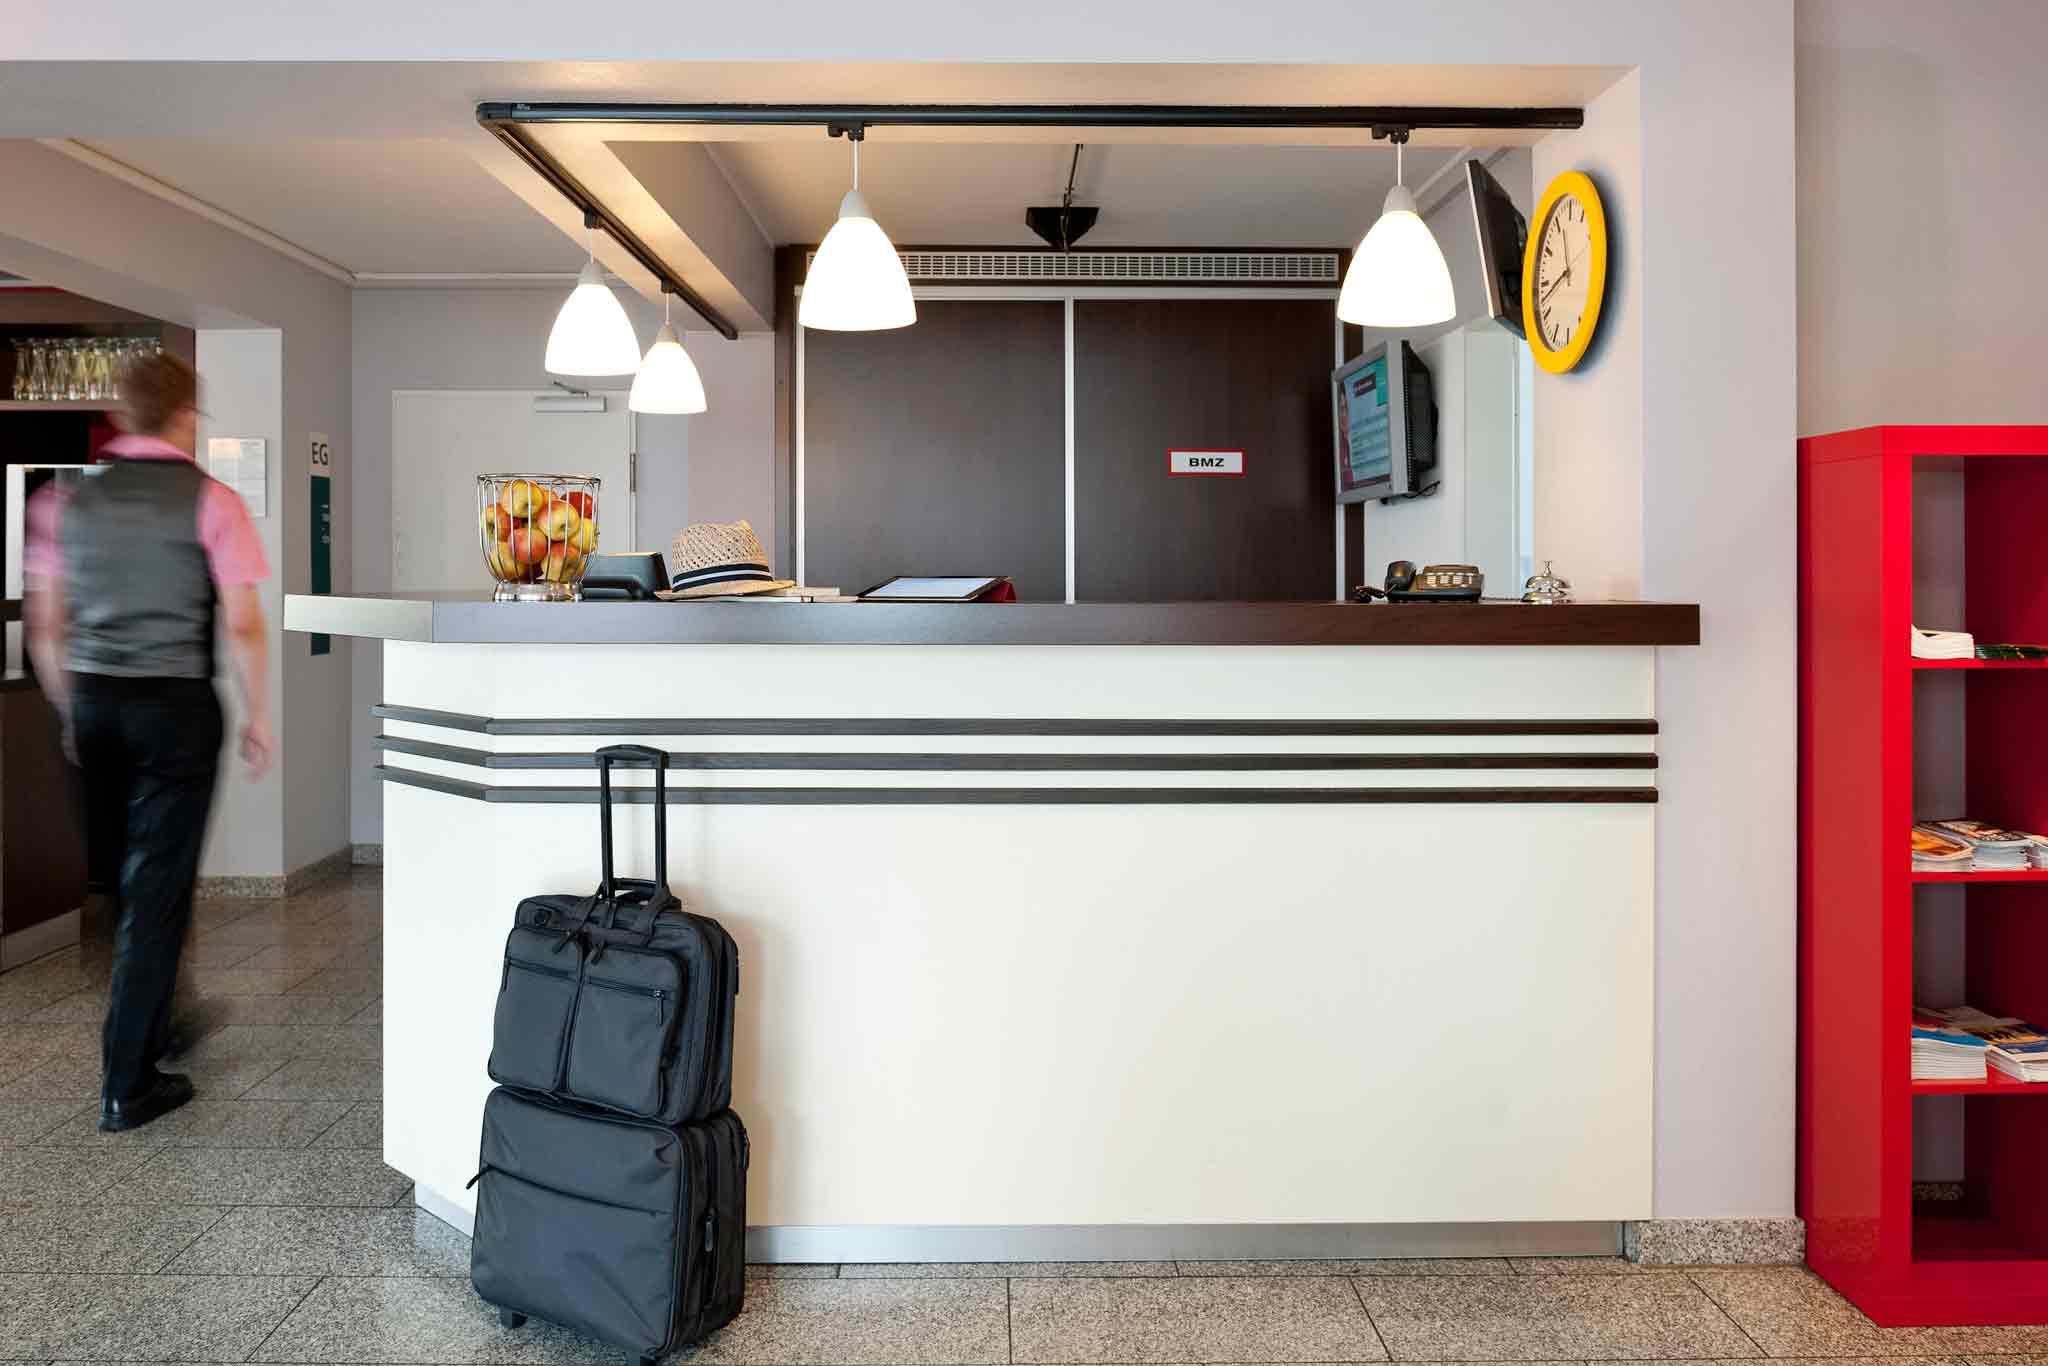 Ibis Hotel Köln Leverkusen Buitenaanzicht